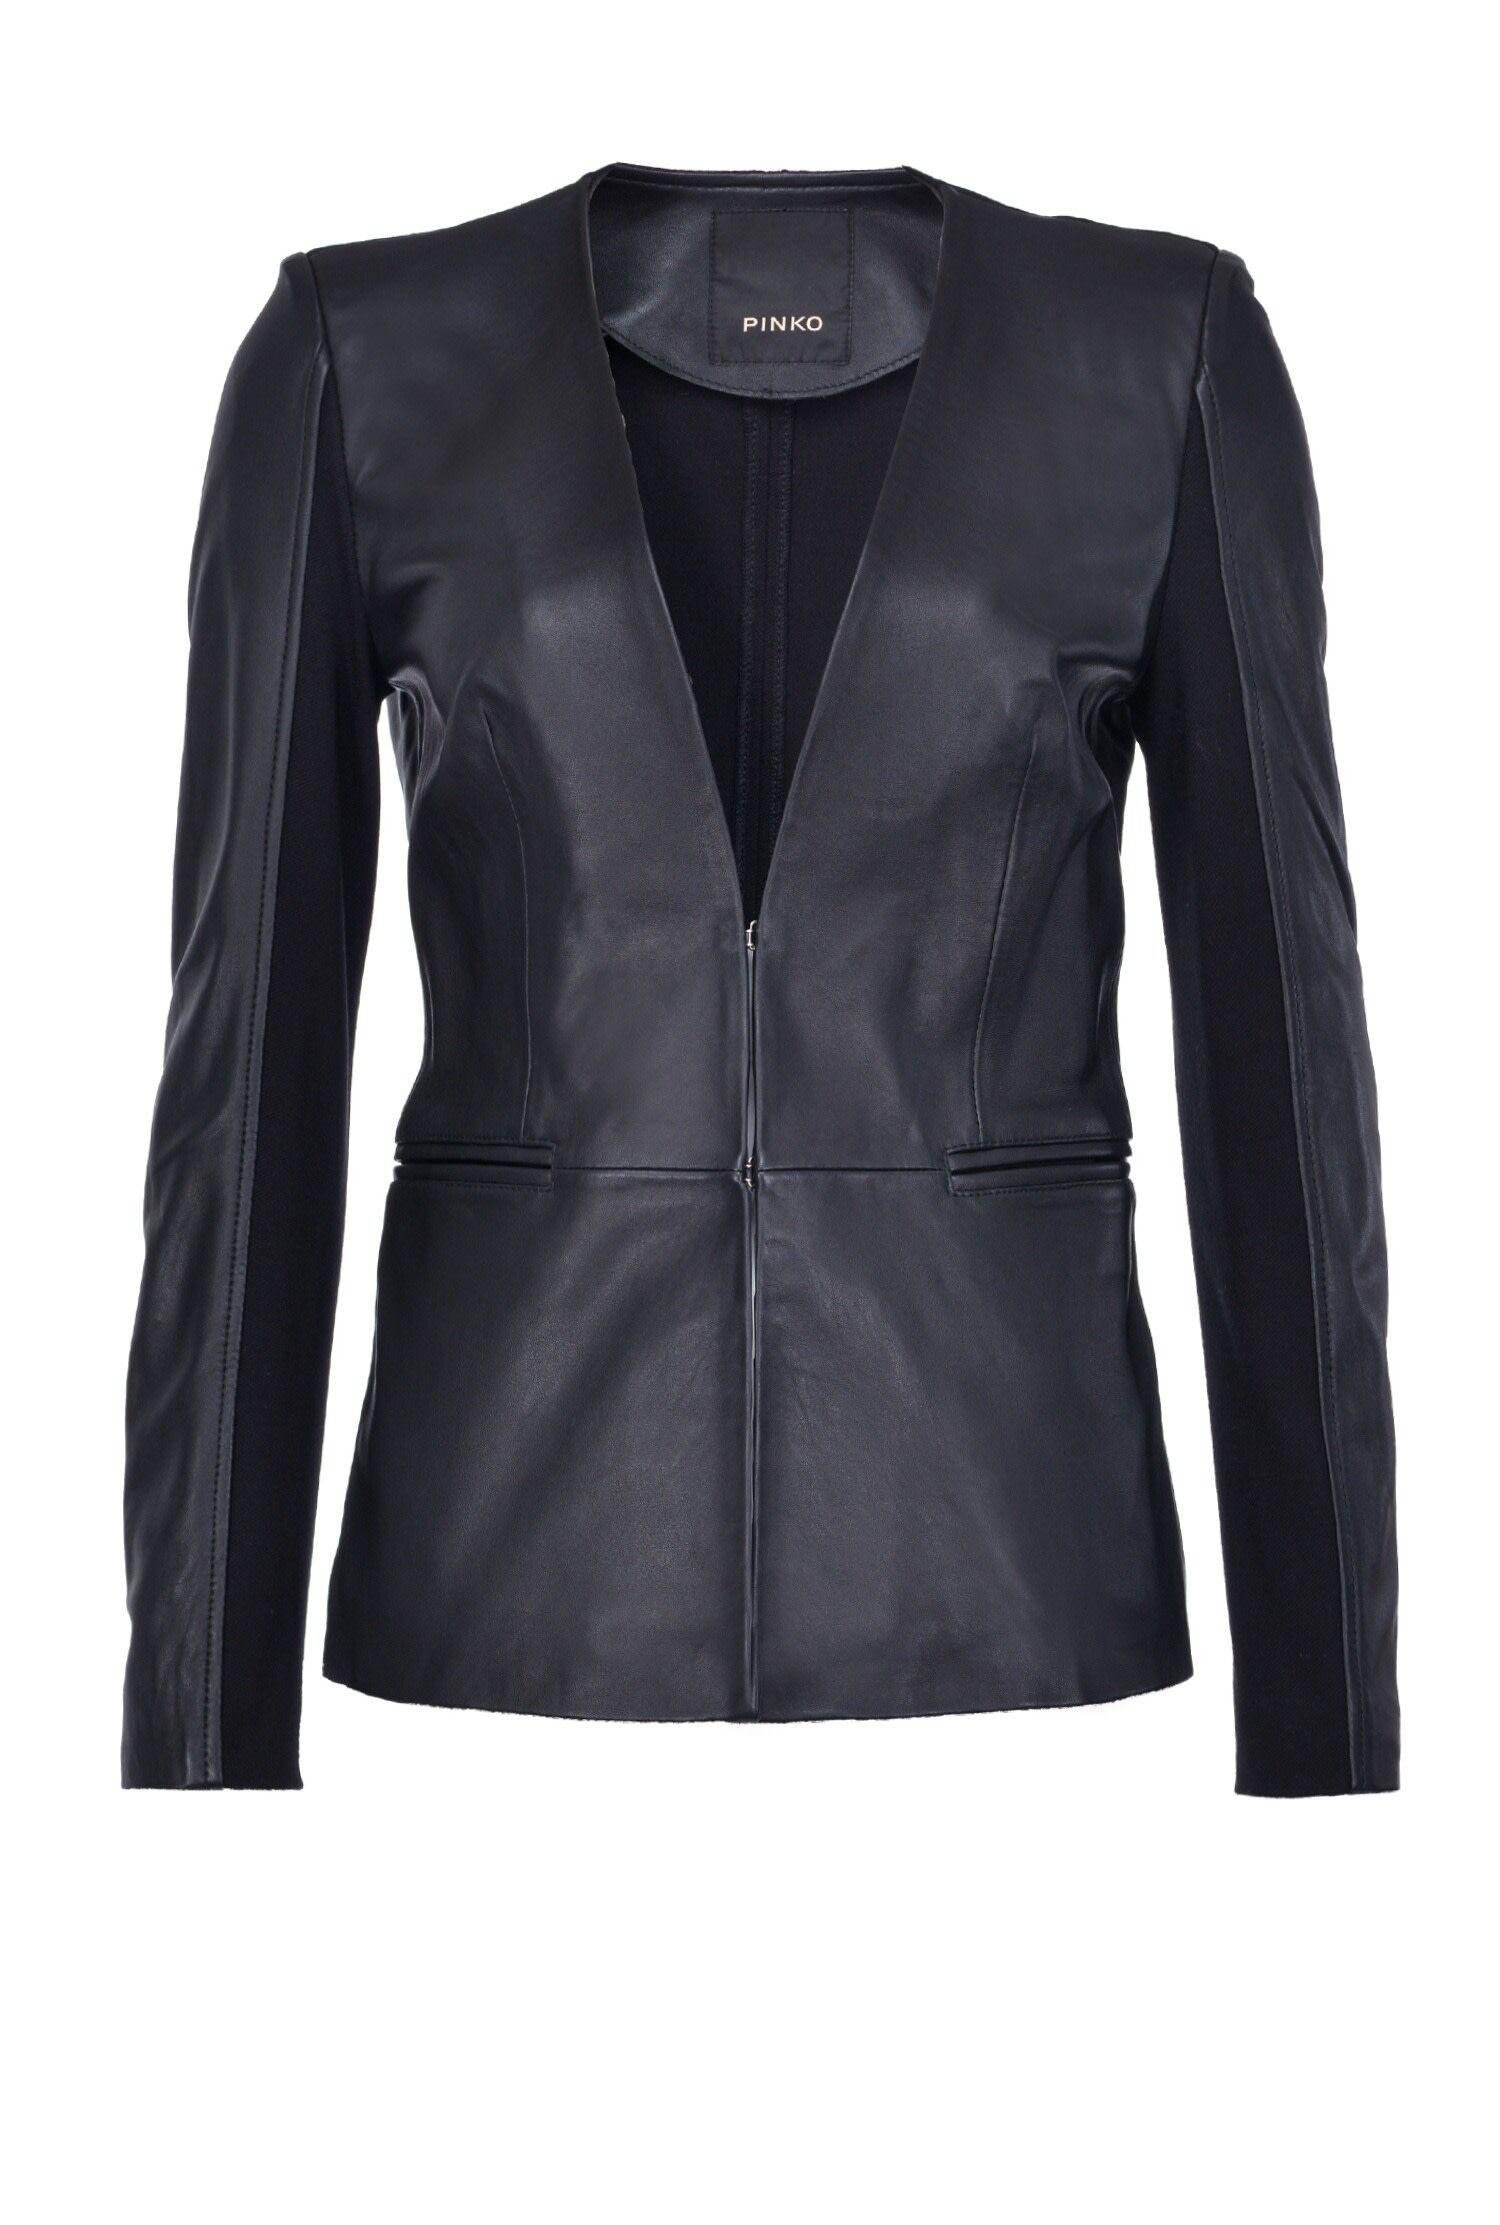 Long Bimaterial Jacket - Pinko